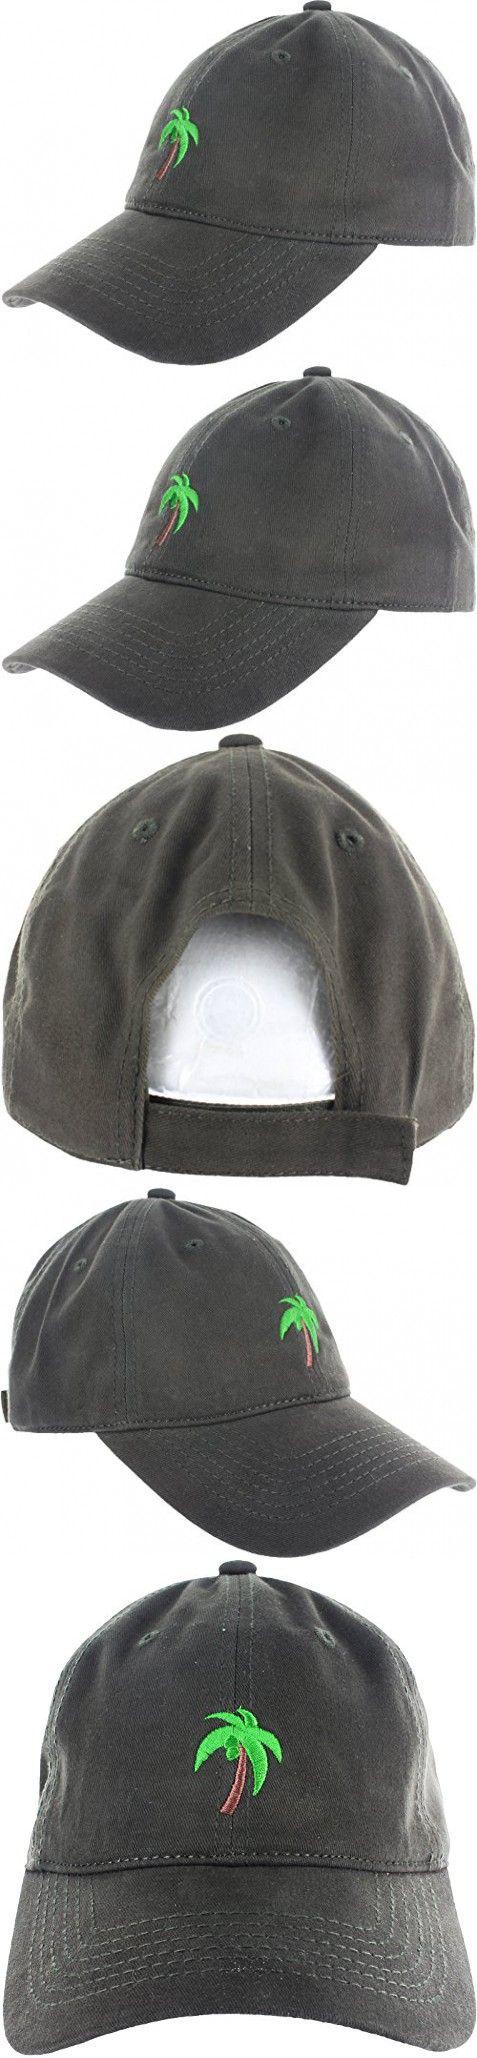 Dad Hat Cap - Palm Tree Emoji Embroidered Adjustable Dark Green Baseball Cap